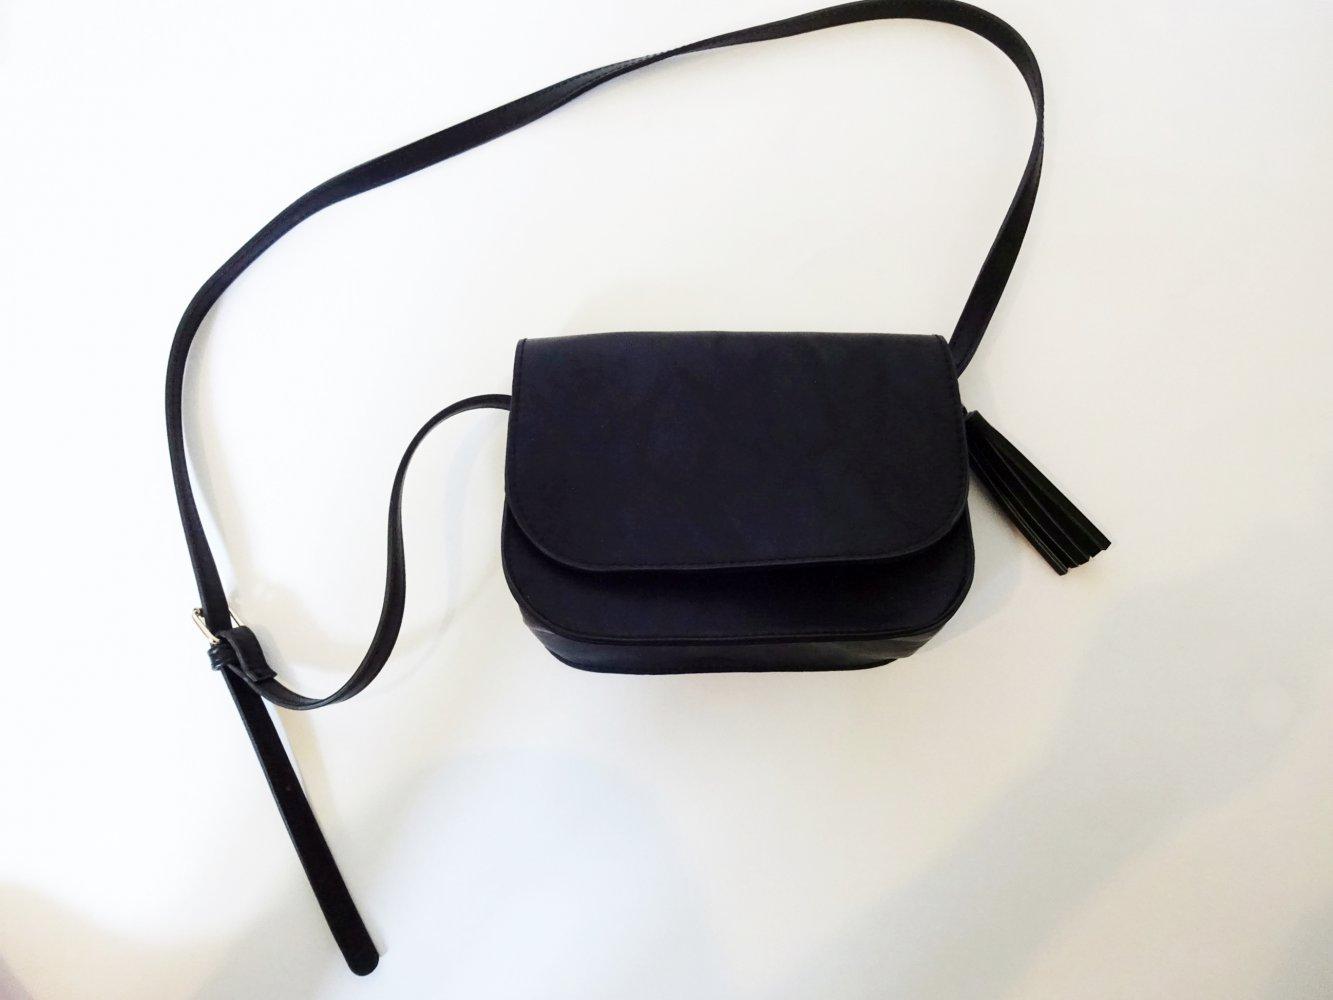 Schwarze Handtasche Basic Umhängetasche Crossbody Bag Neu